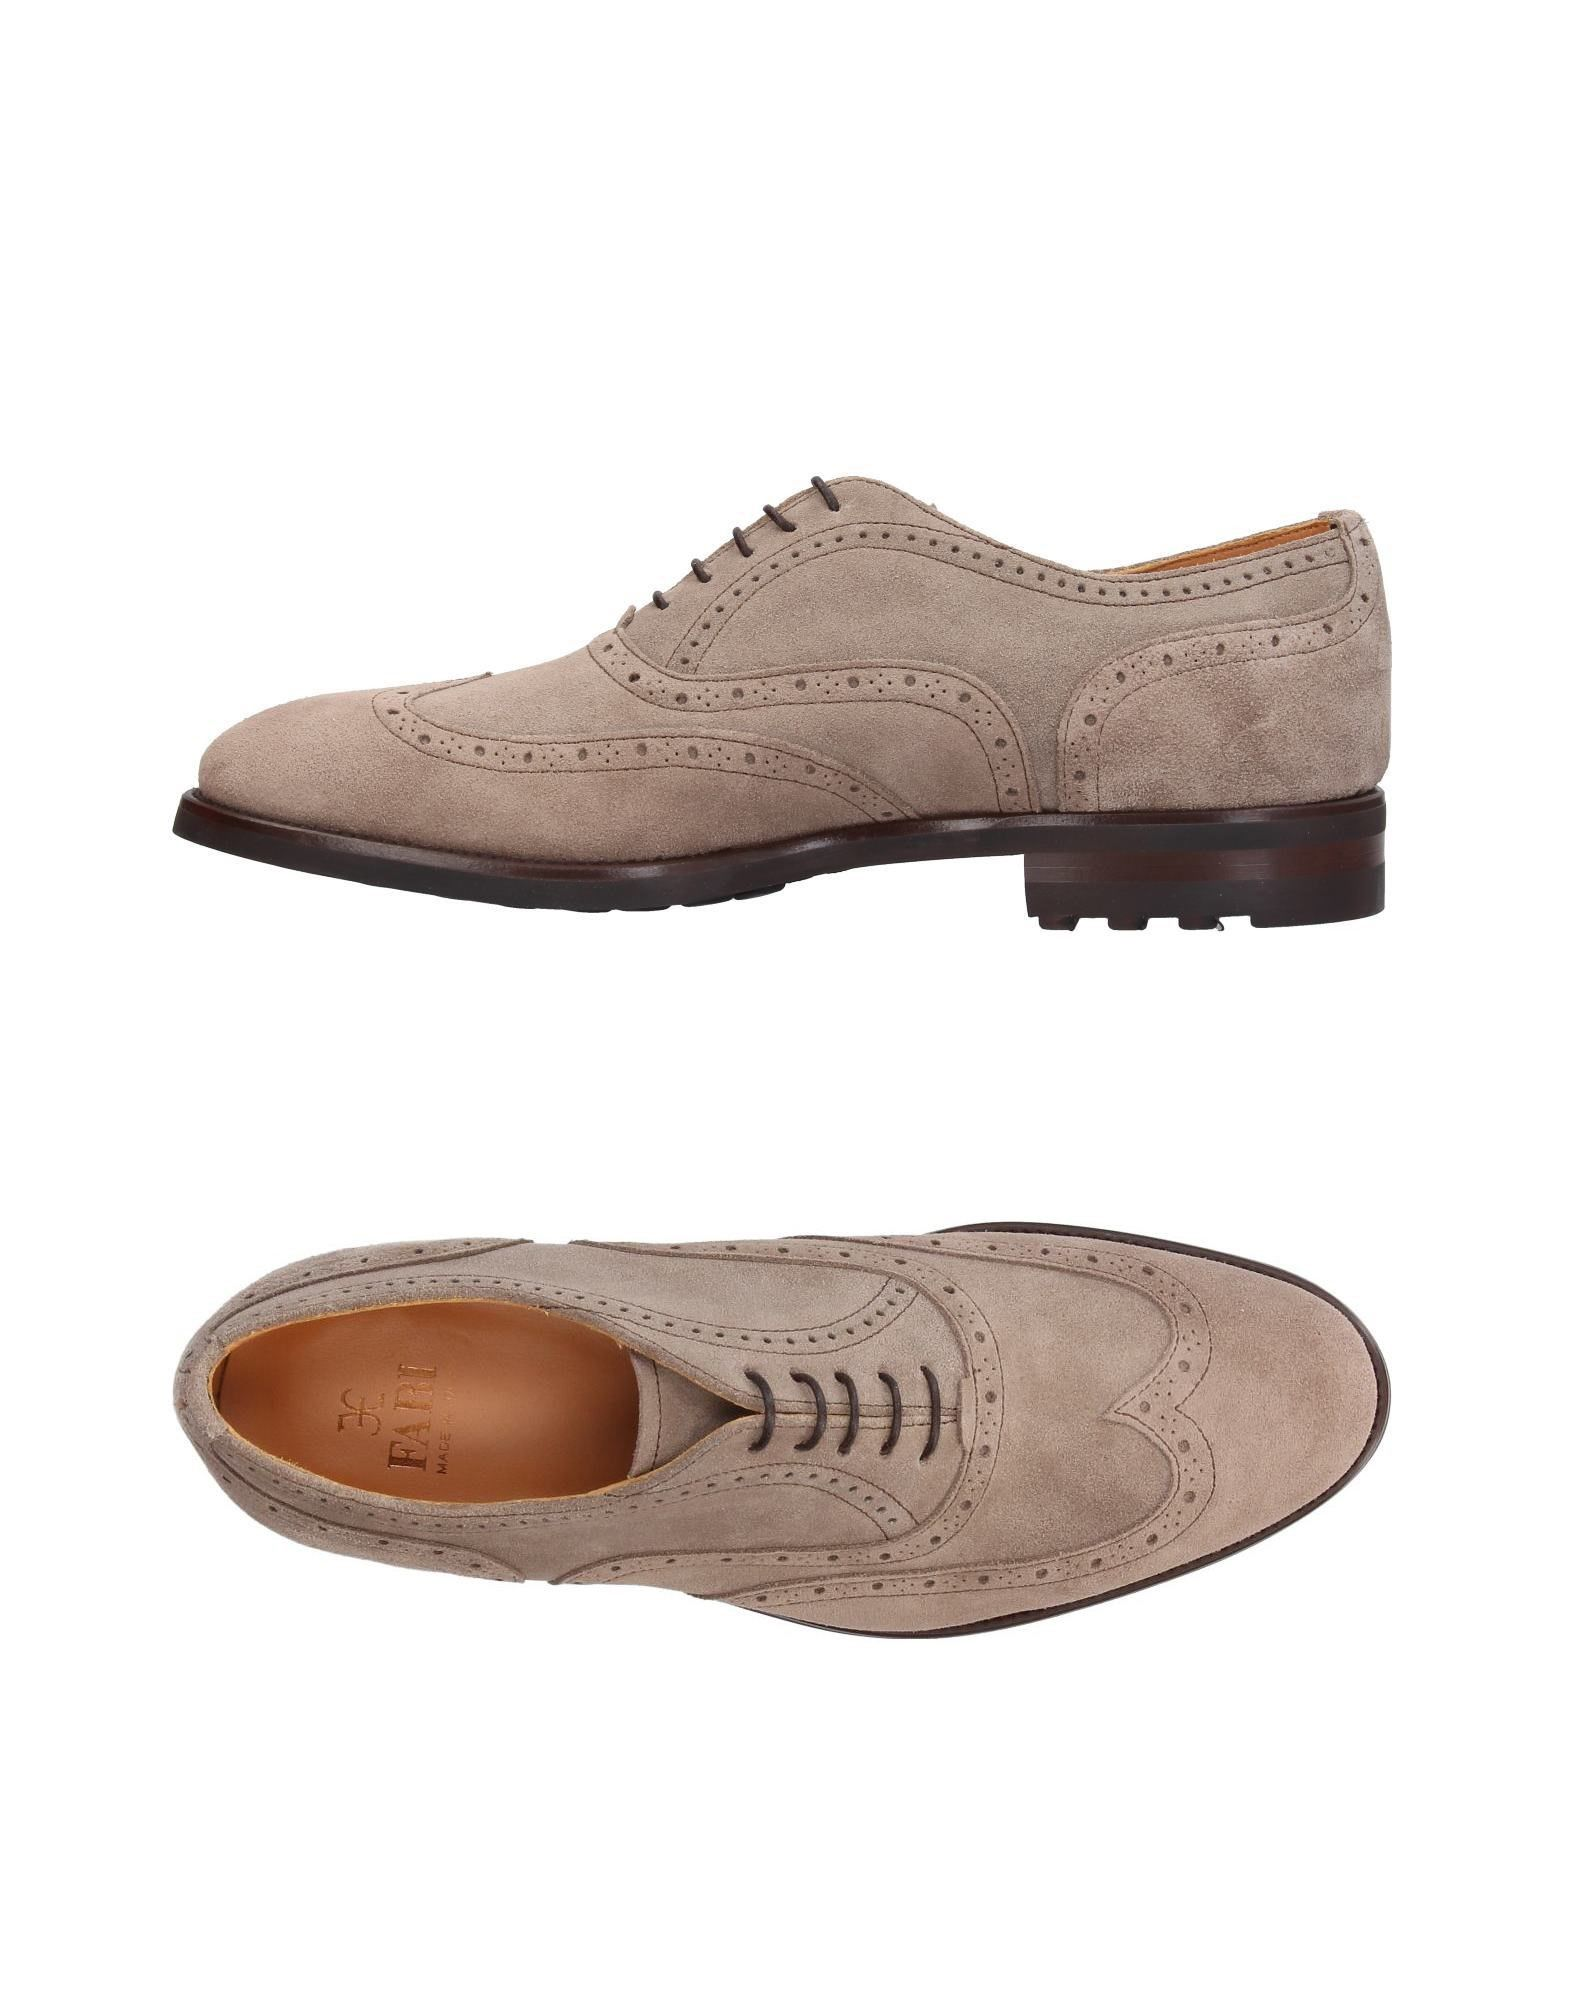 Fabi Schnürschuhe Schnürschuhe Fabi Herren  11387747XT Gute Qualität beliebte Schuhe 6175ca